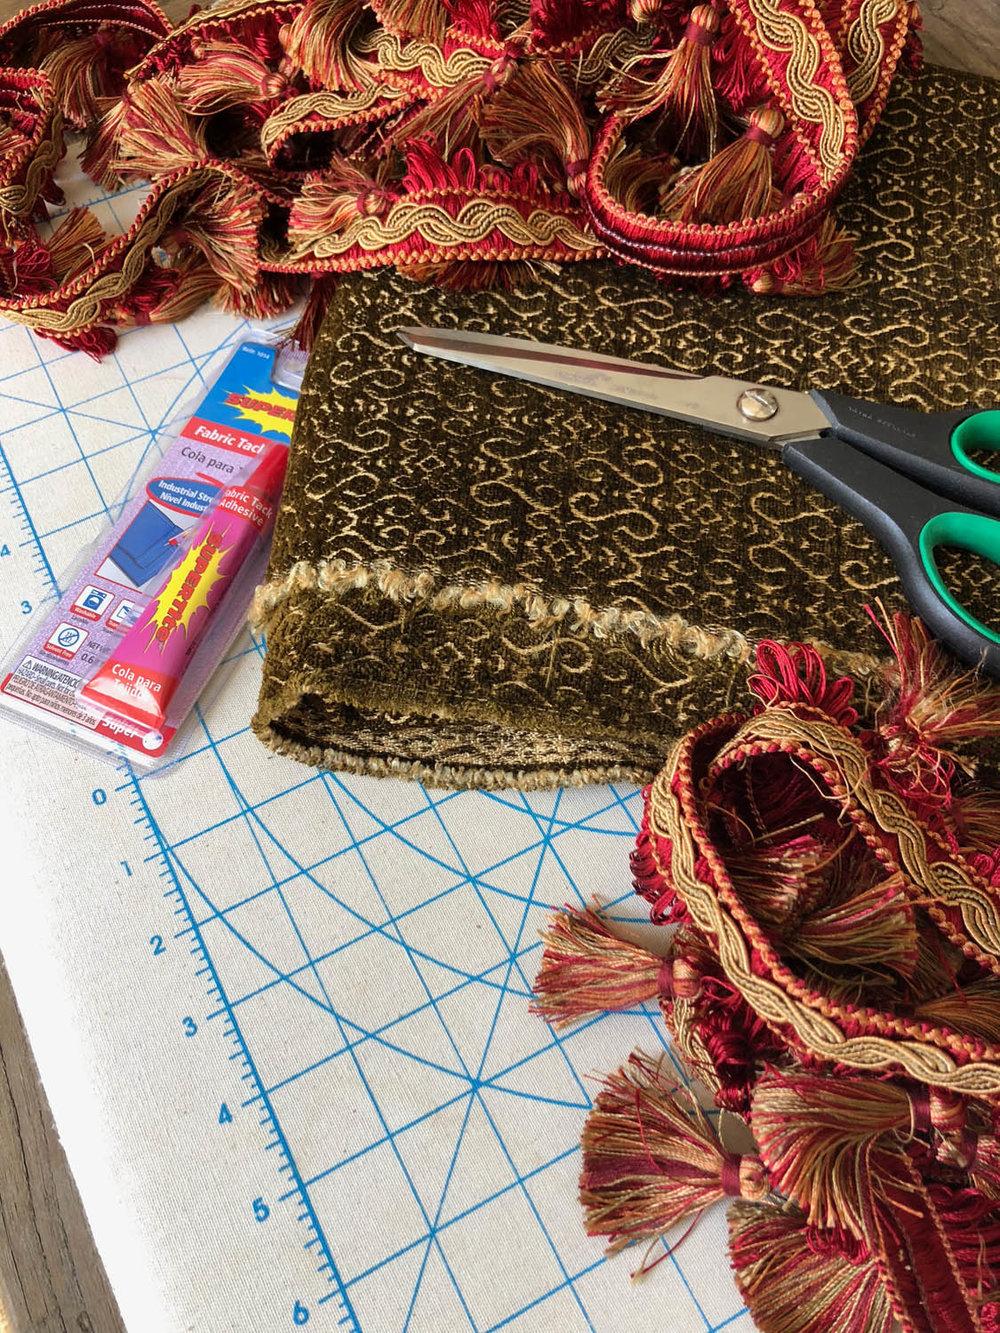 Reversible upholstery fabric glue, scissors, purchased fringe trim for making no-sew Christmas tree skirt.